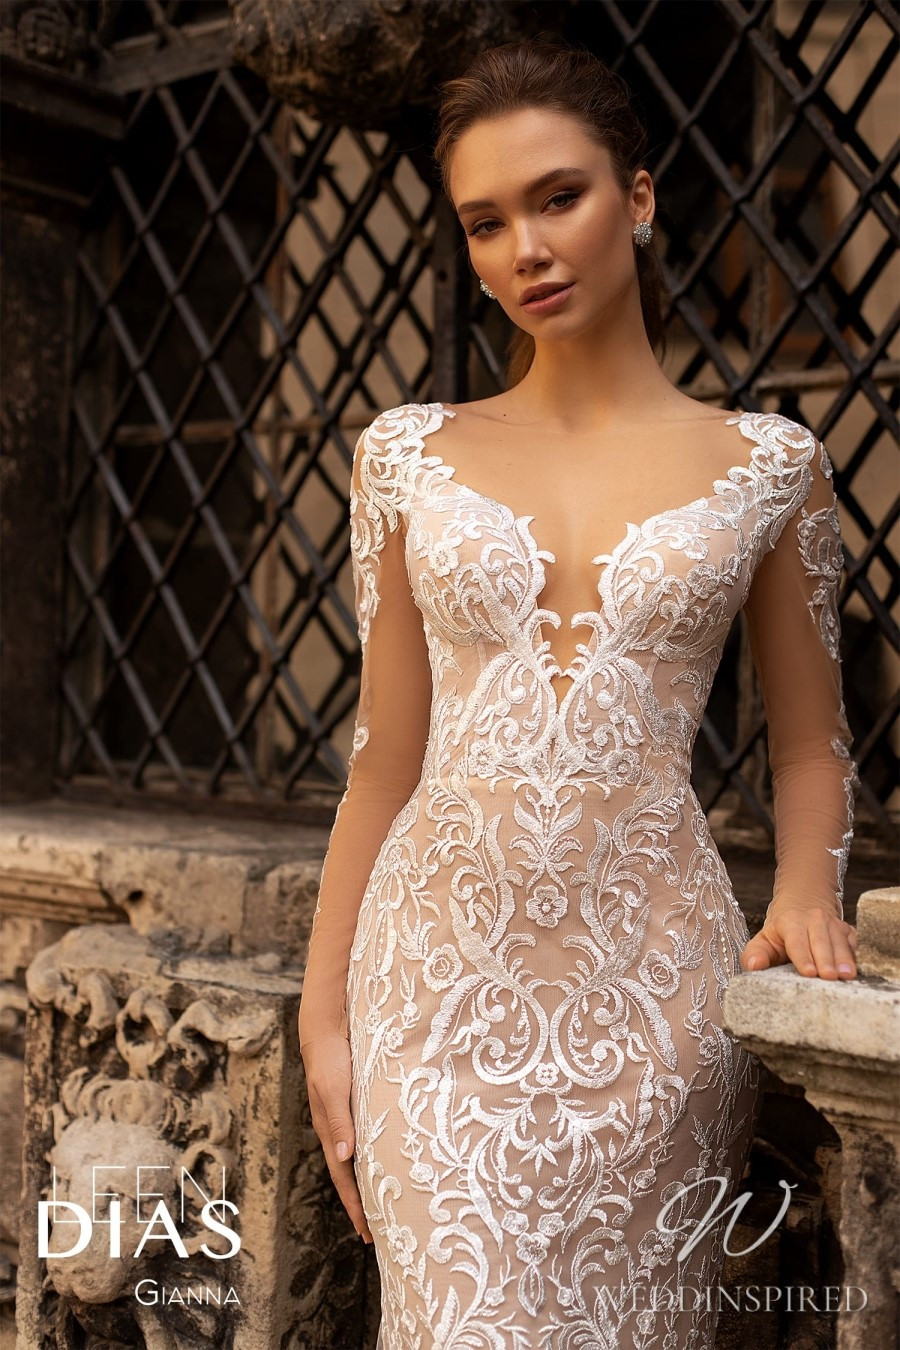 A Leen Dias 2021 nude lace mermaid wedding dress